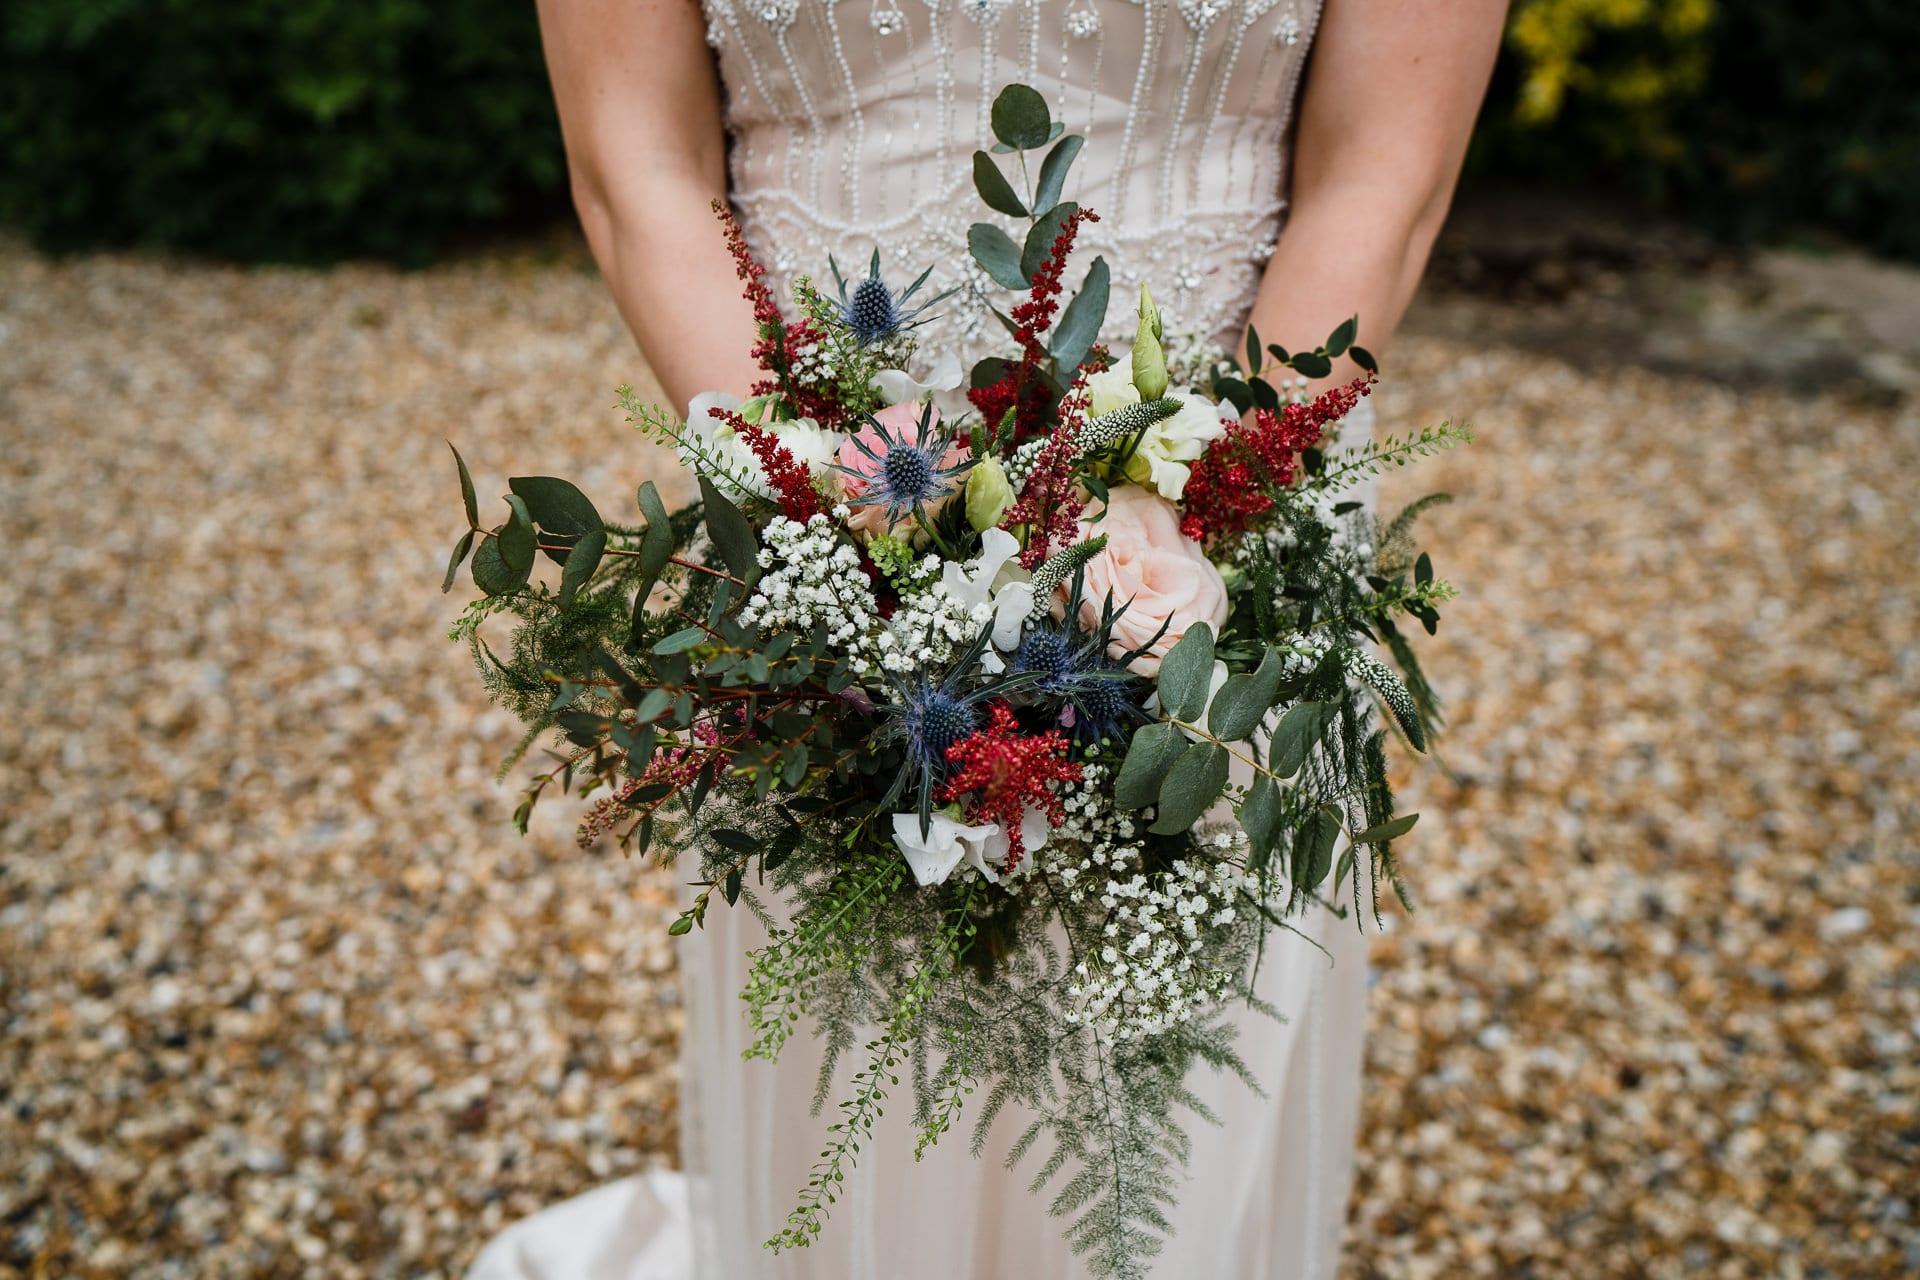 Bridal bouquet featuring Scottish thistles